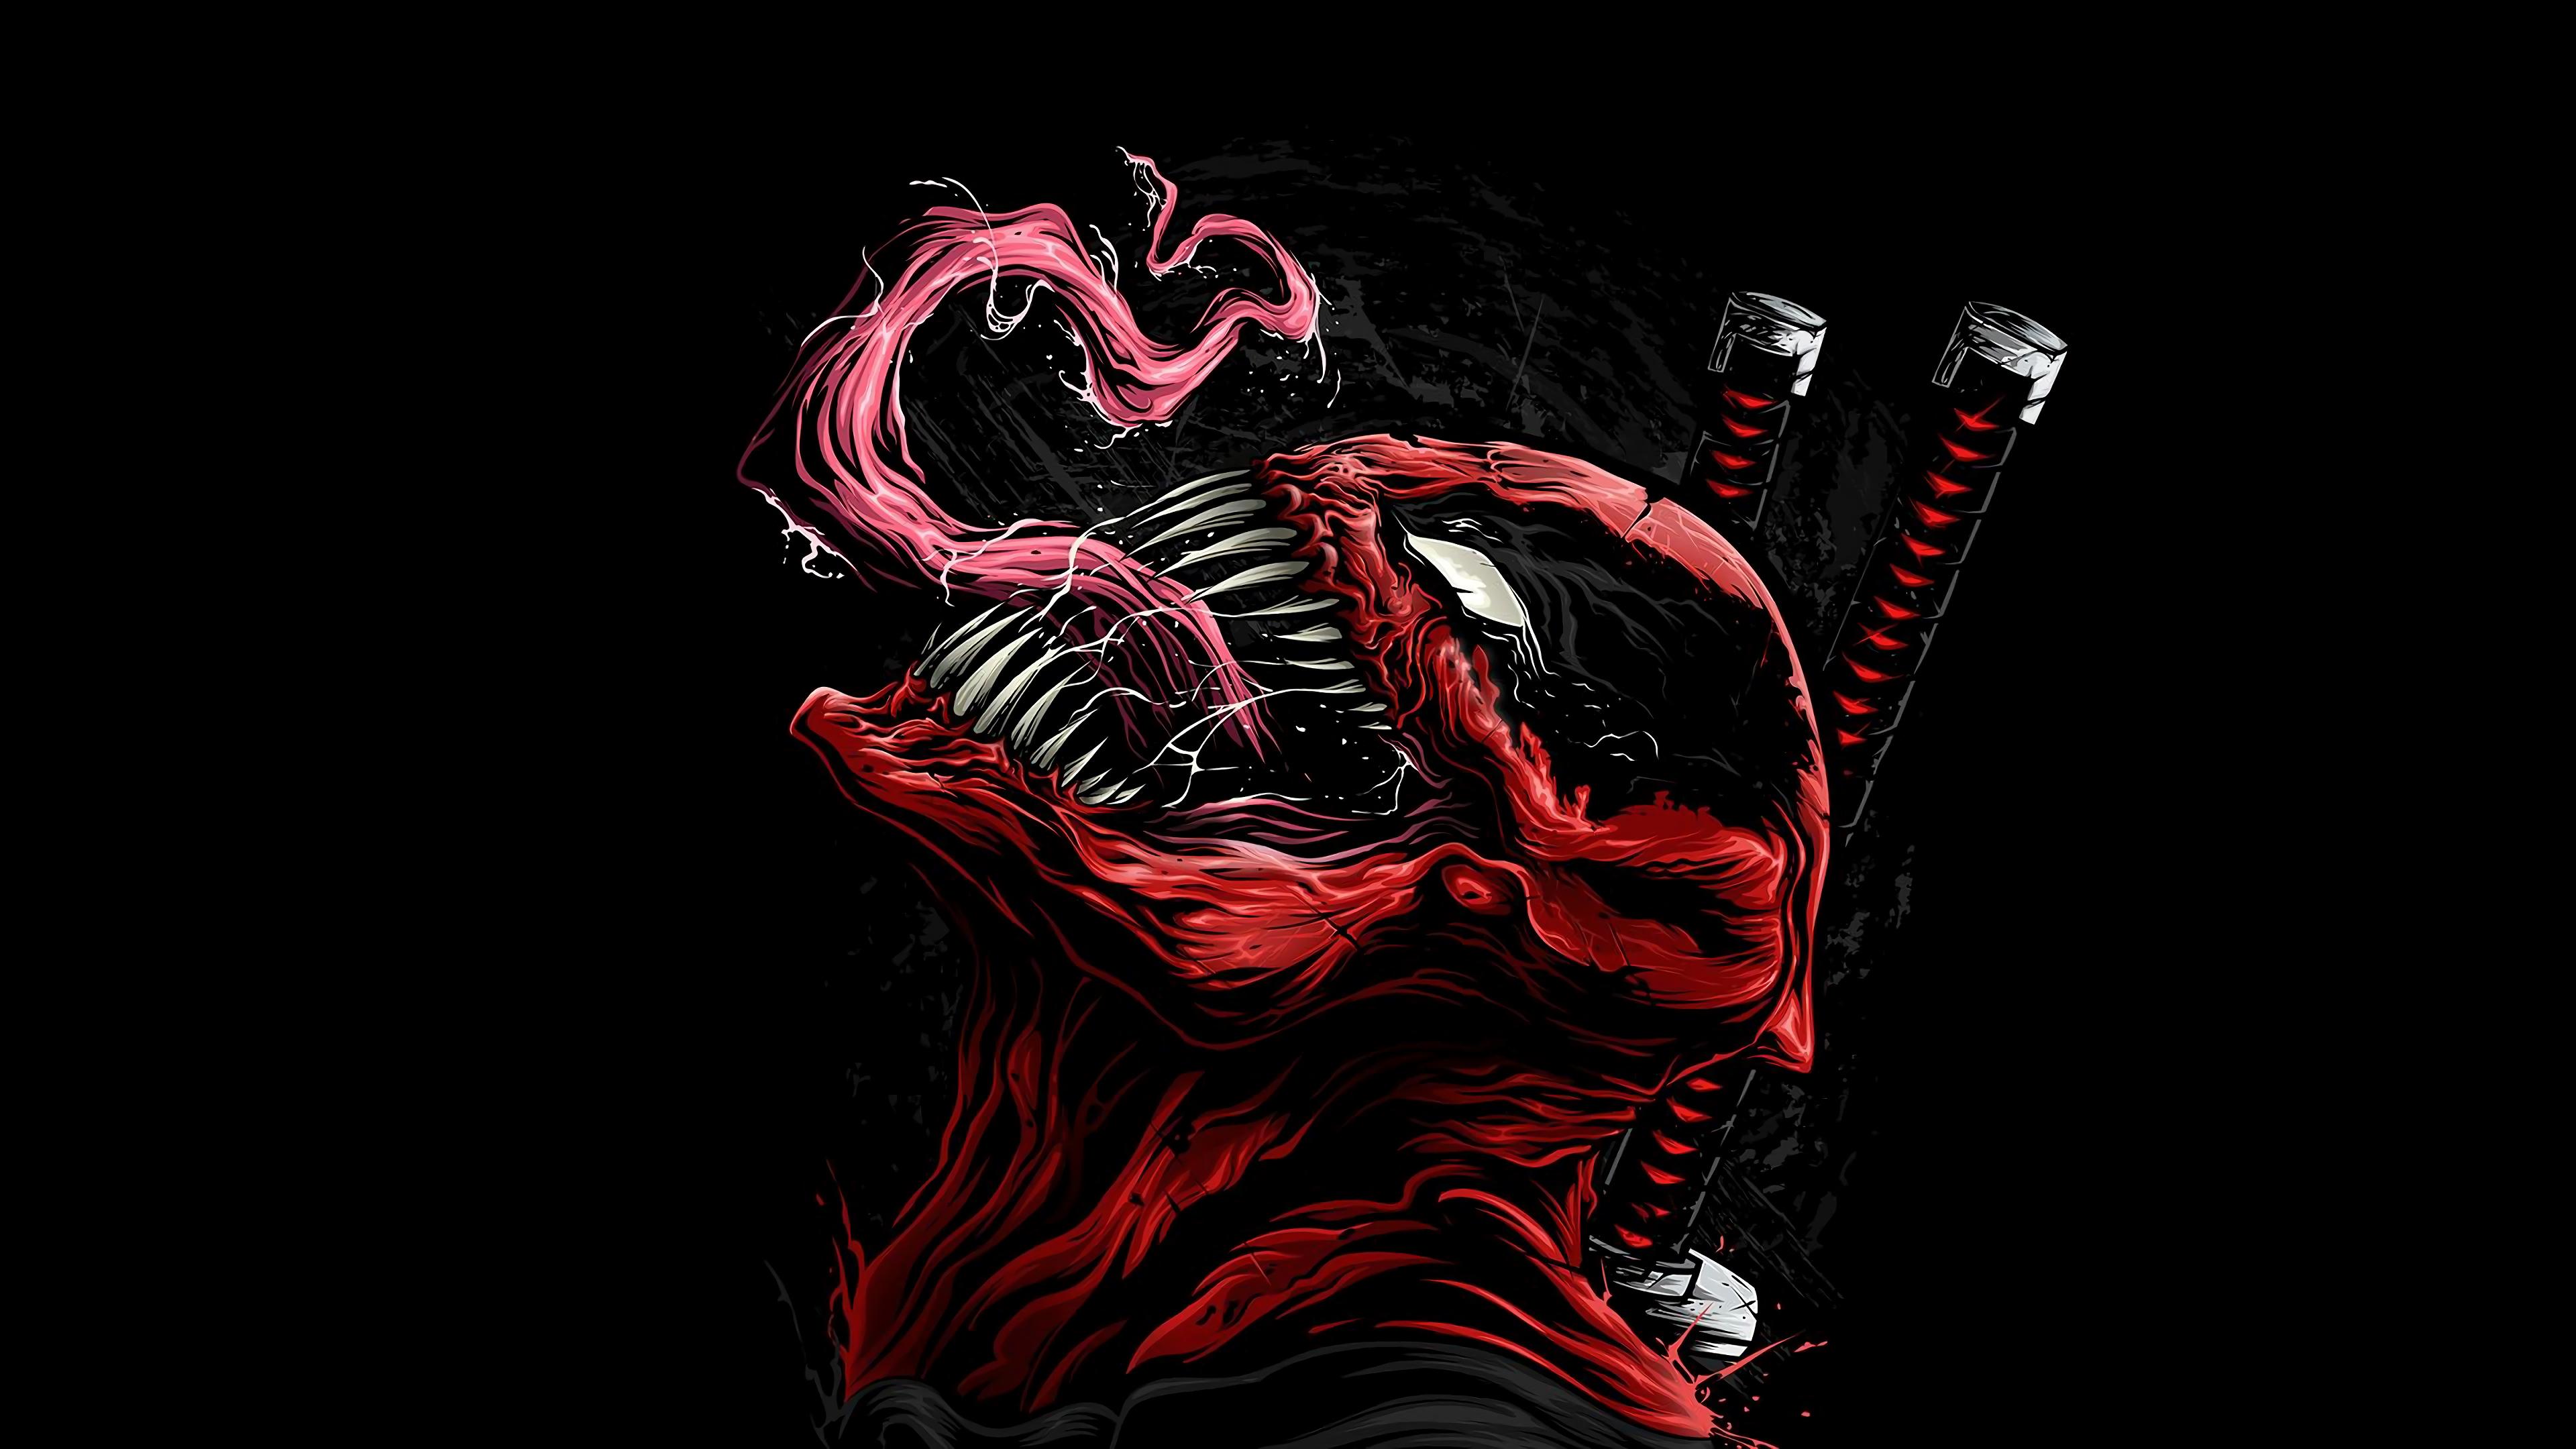 deadpool venom marvel comics 4k wallpaper 1544830303 - Deadpool Venom Marvel Comics 4K Wallpaper - venom, Marvel Comics, Deadpool, Comics